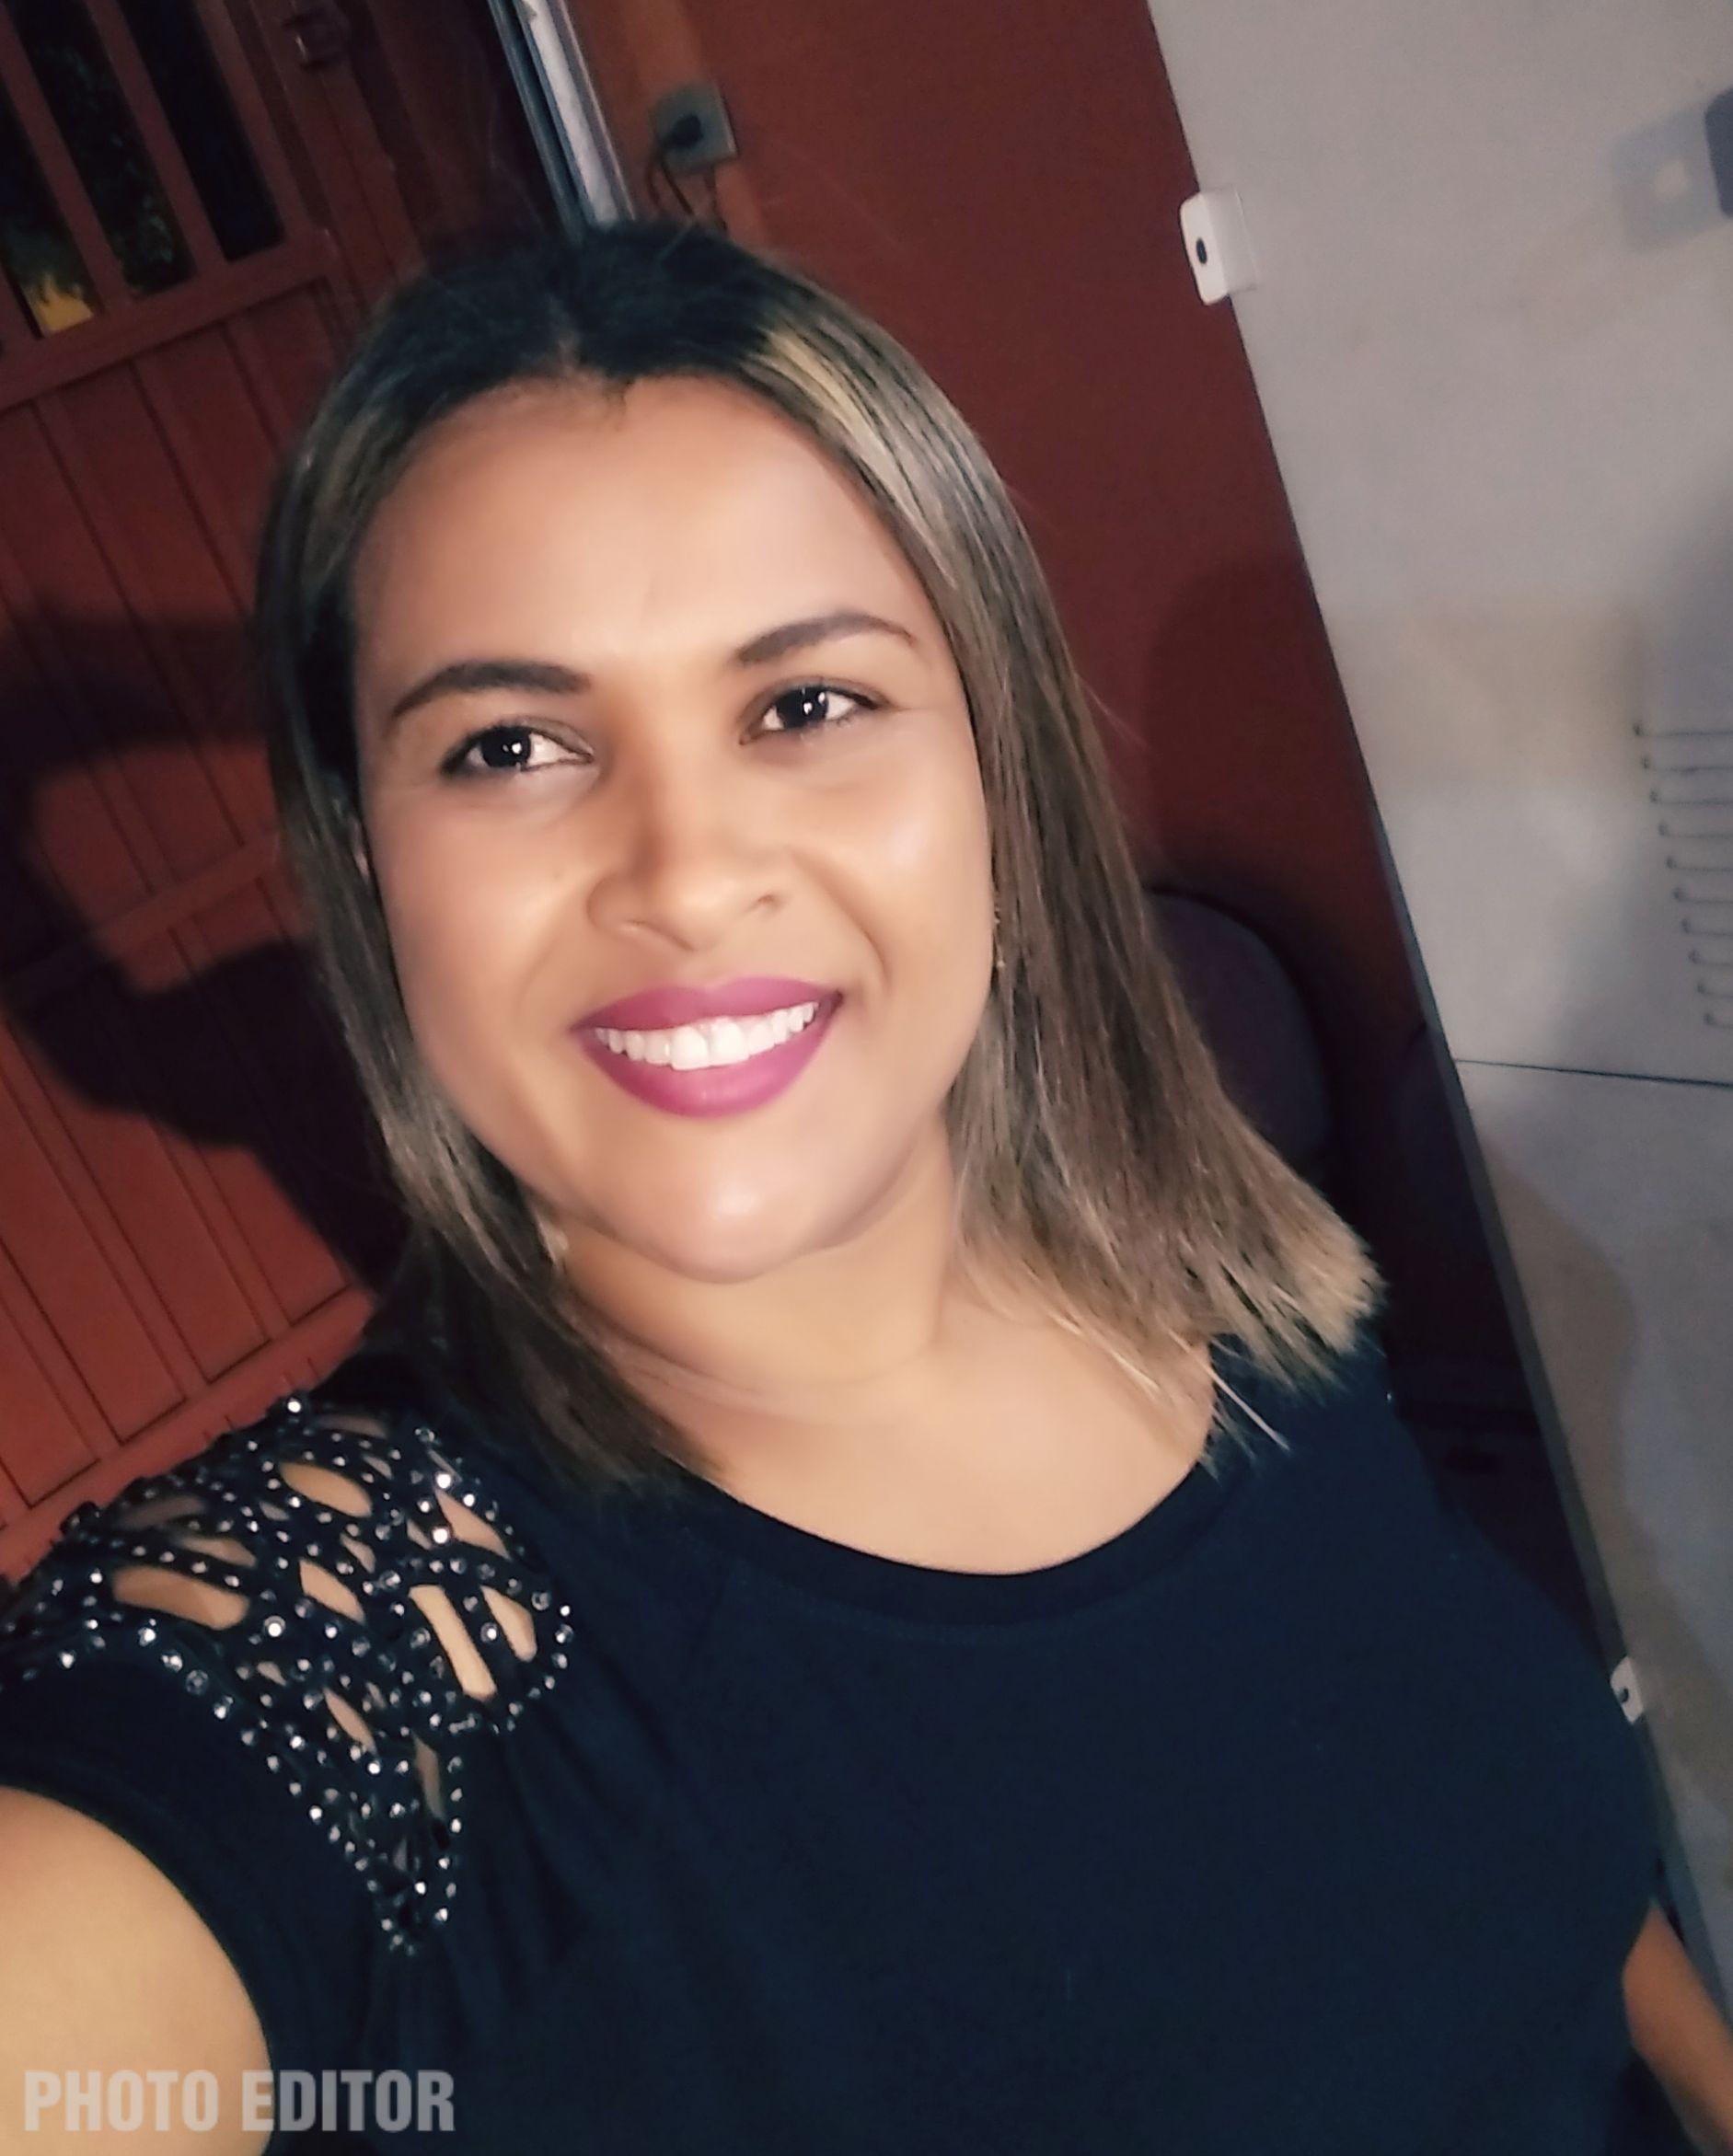 Joelma Bastos Sobre o Carreira Beauty